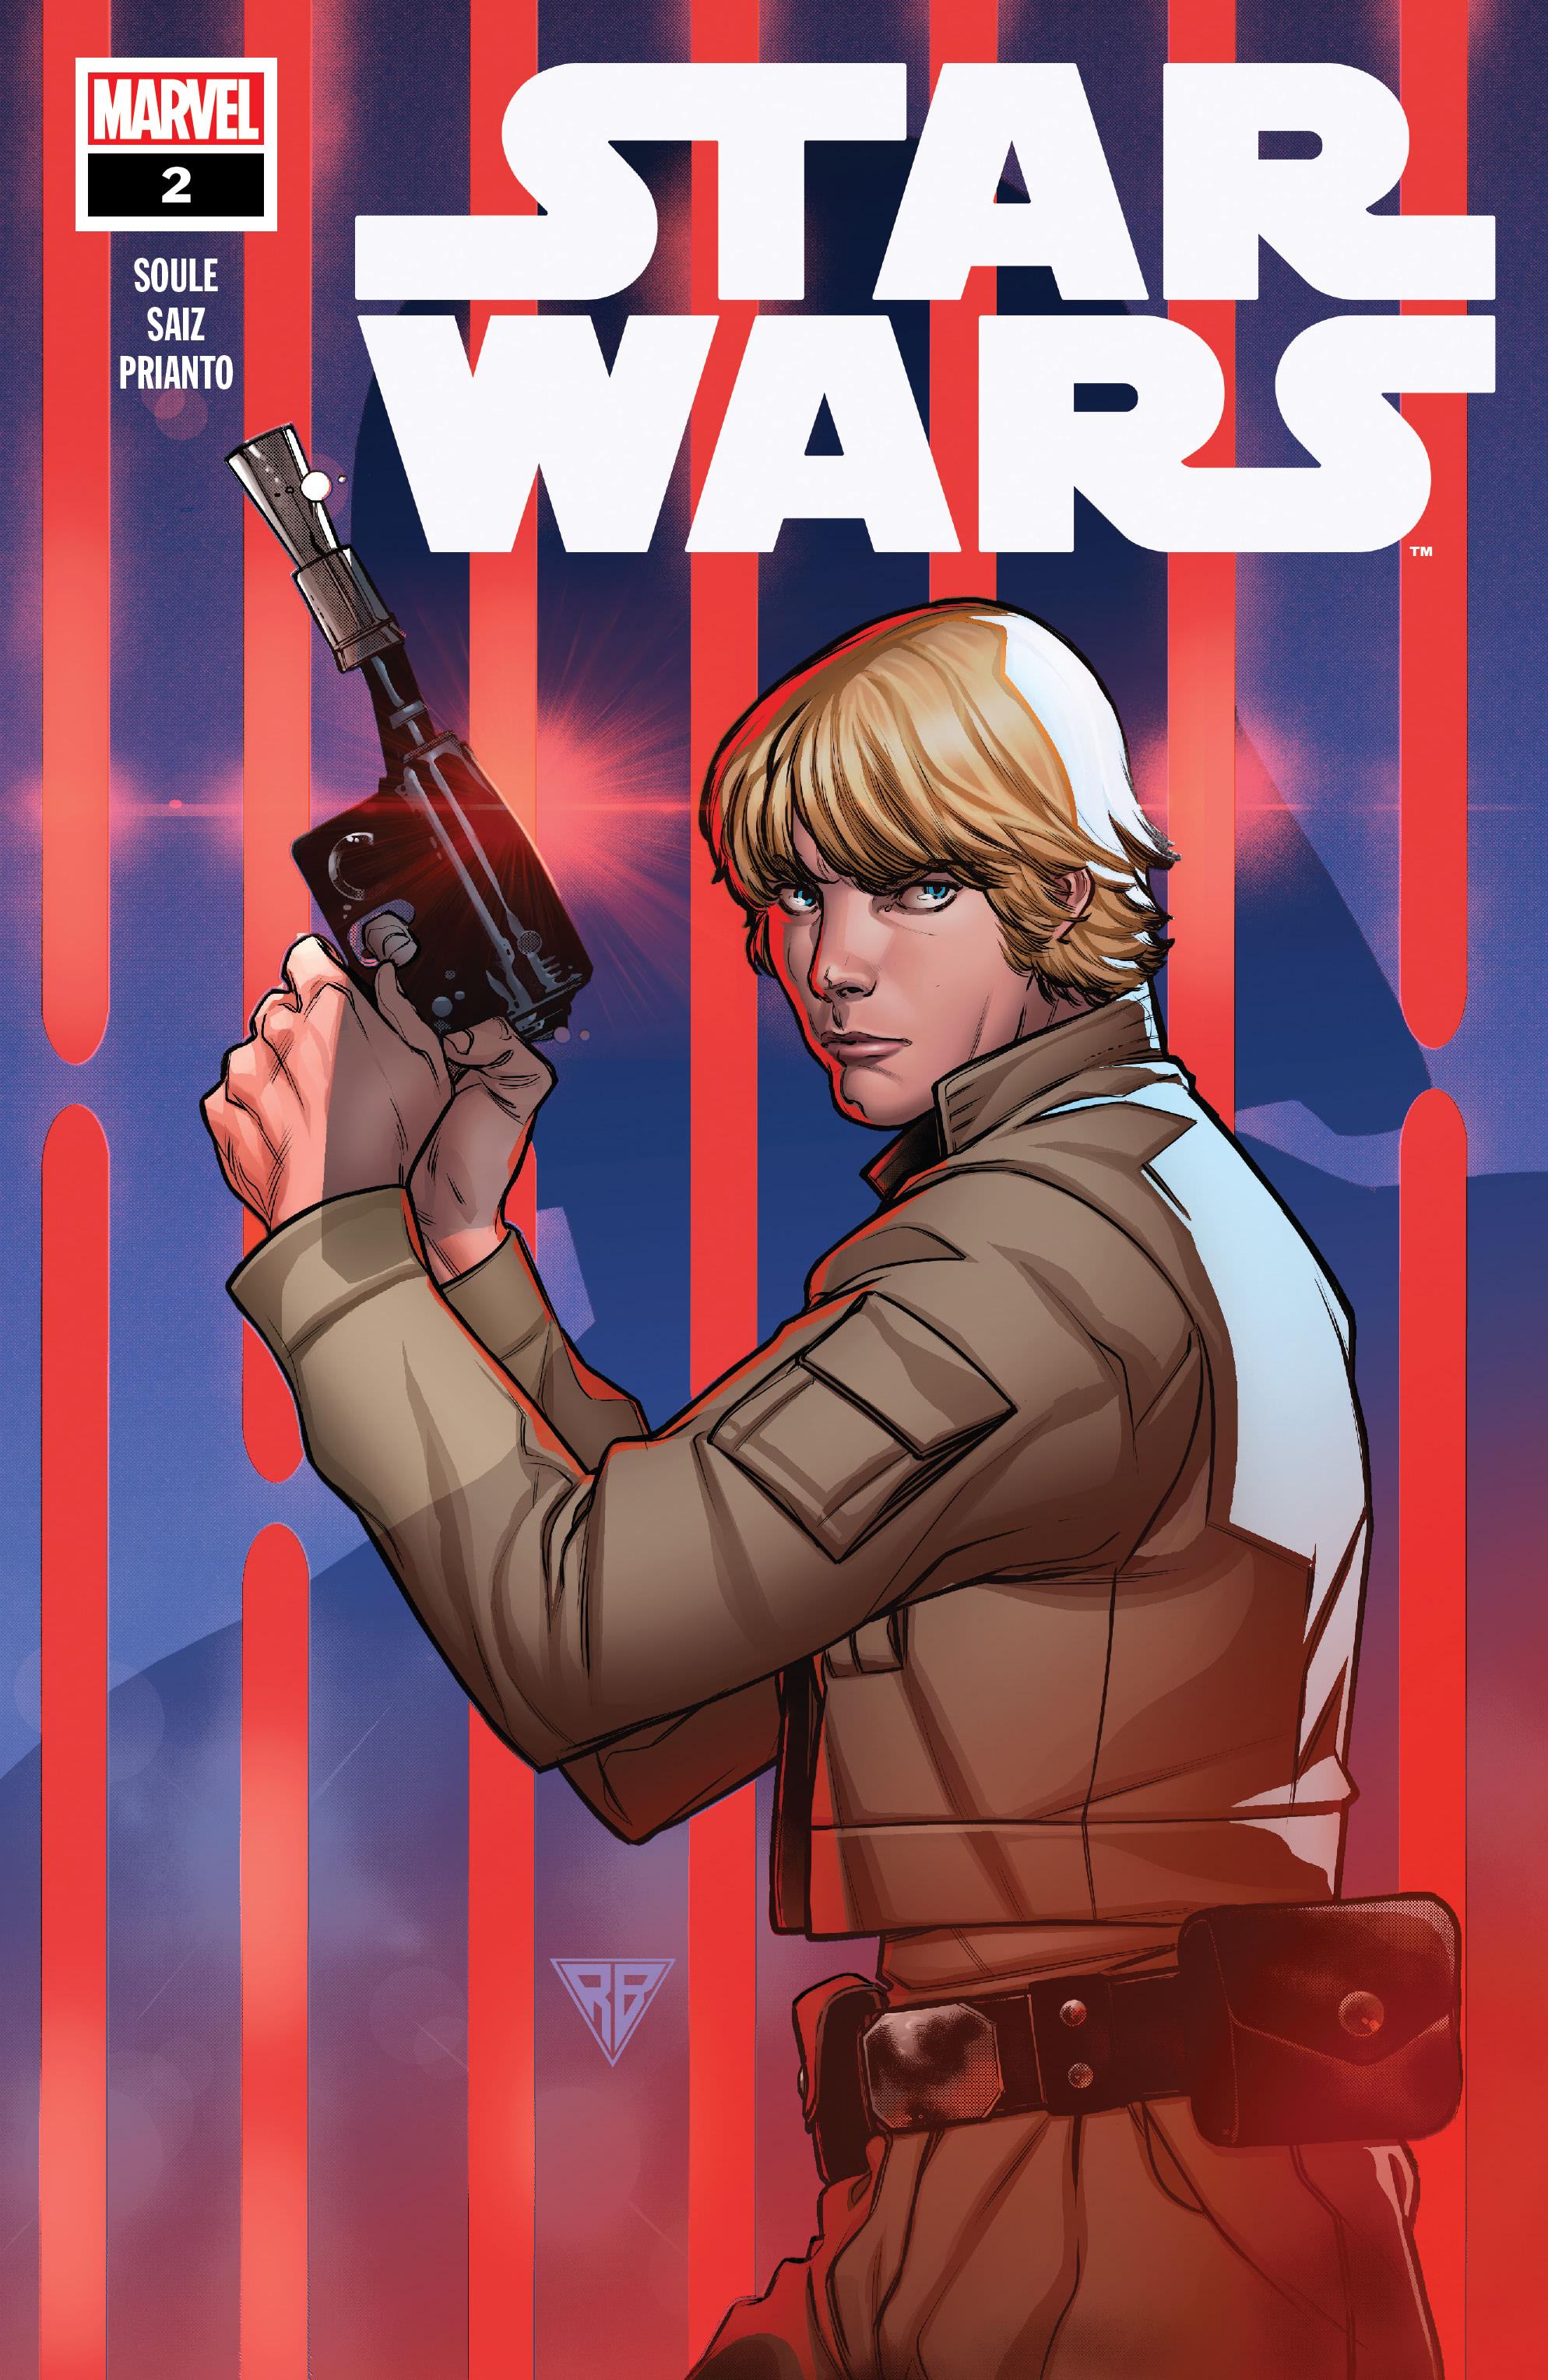 Star Wars Luke Leia Kenobi Han Solo Vader Millennium Falcon light switch covers